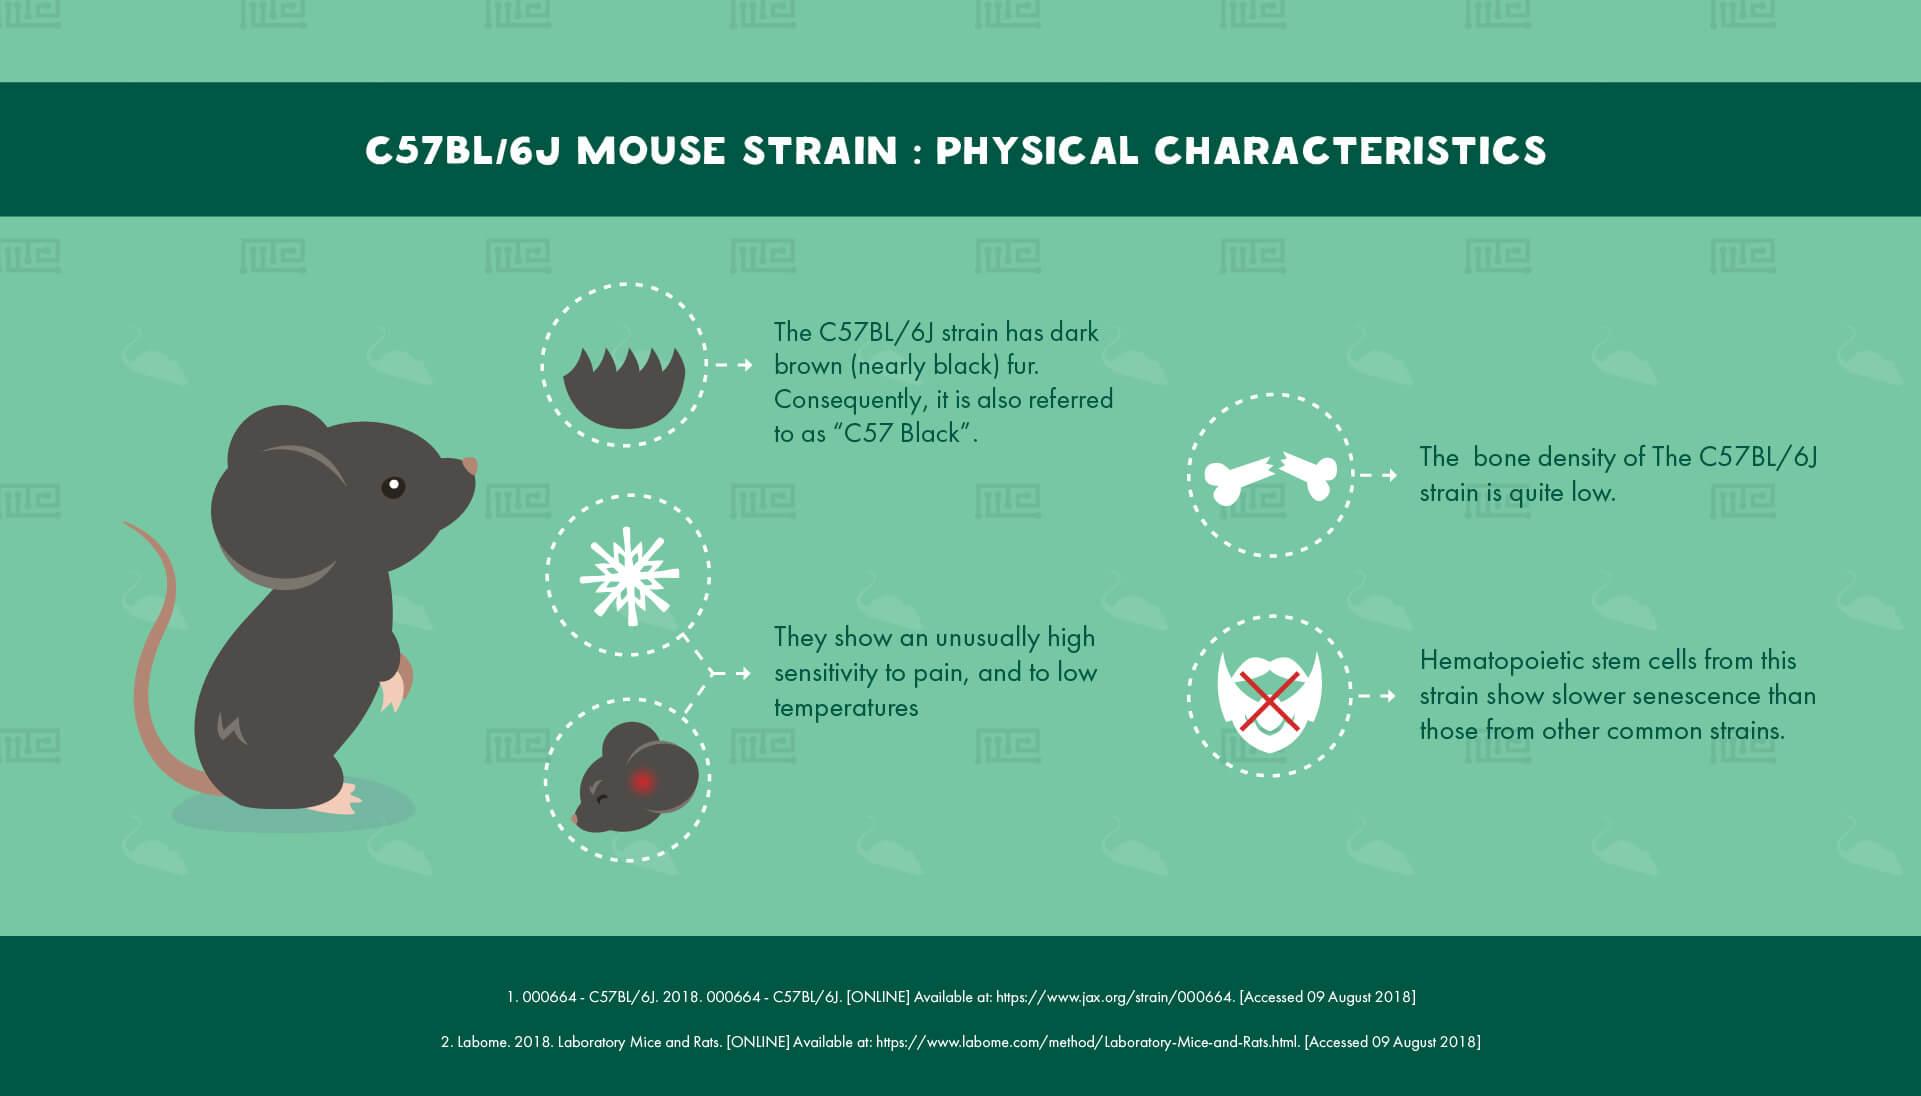 C57BL/6J Mouse Strain : Physical Characteristics